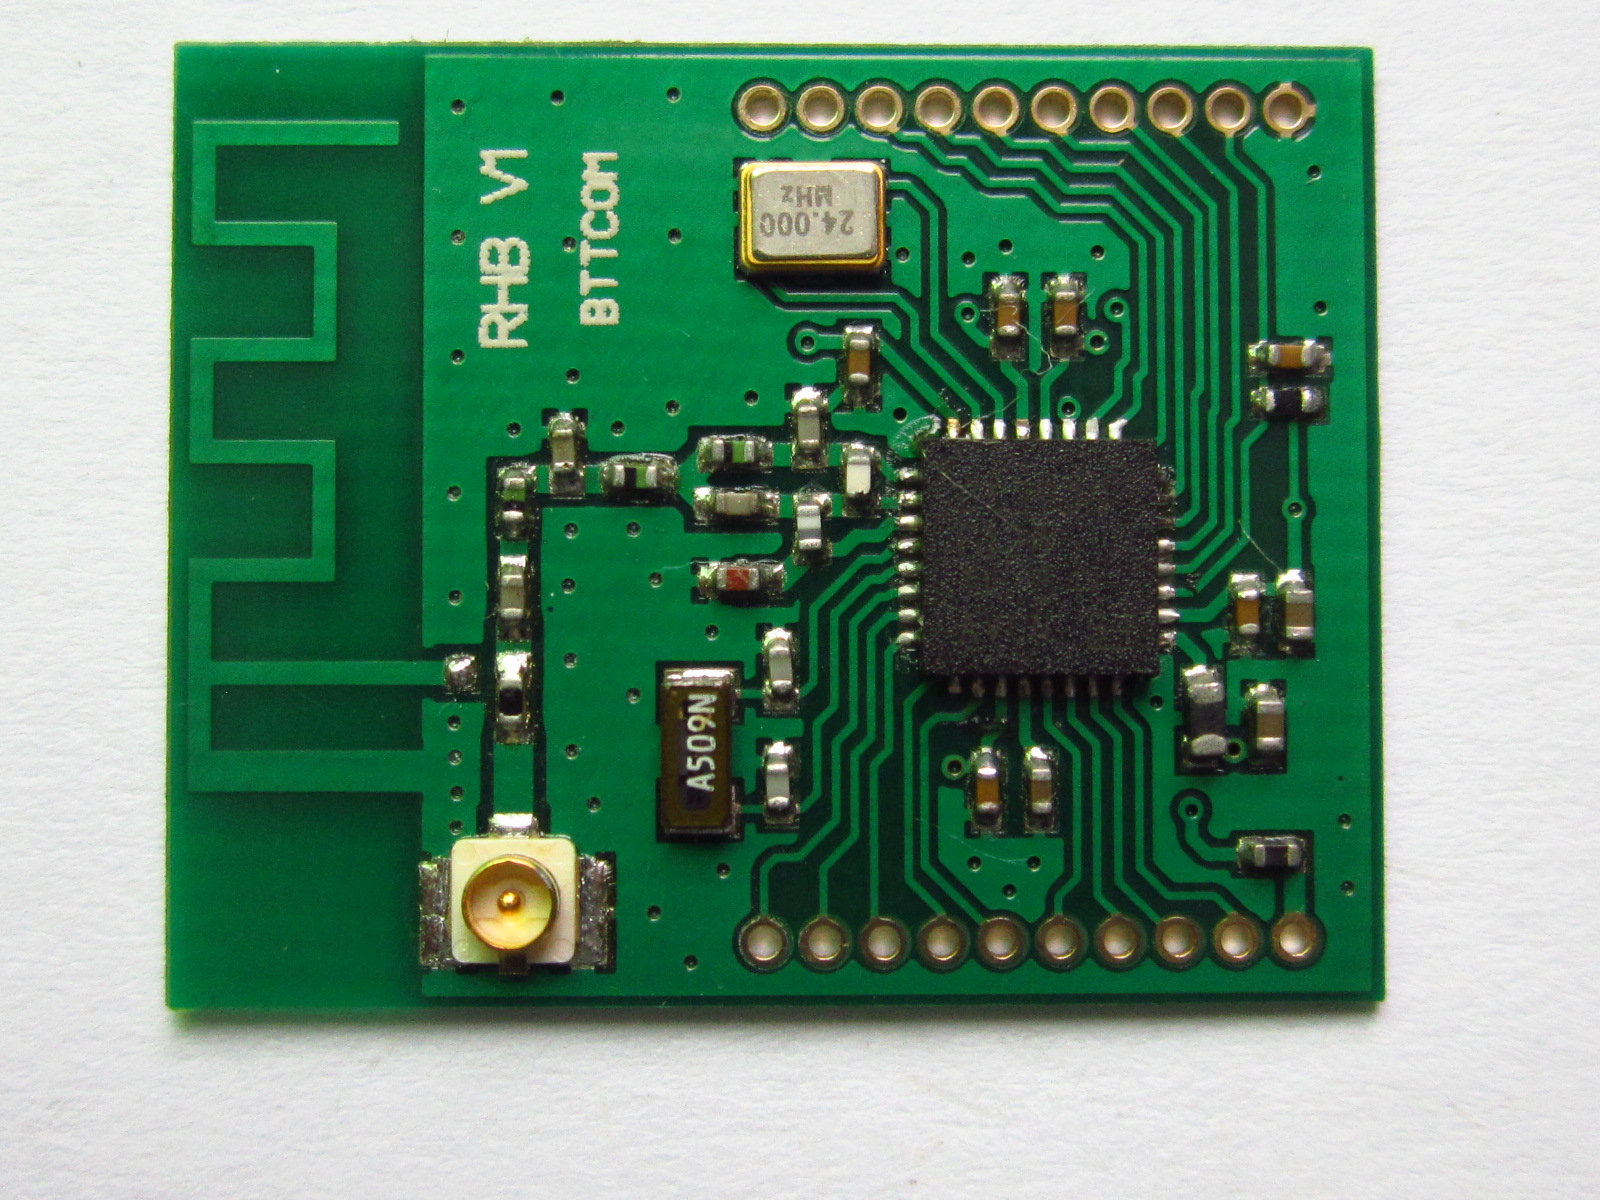 SZ9RH CC2630 RHB Zigbee Wireless Module rs232 switch to zigbee wireless module 1 6 km transmission cc2630 chip far beyond cc2530